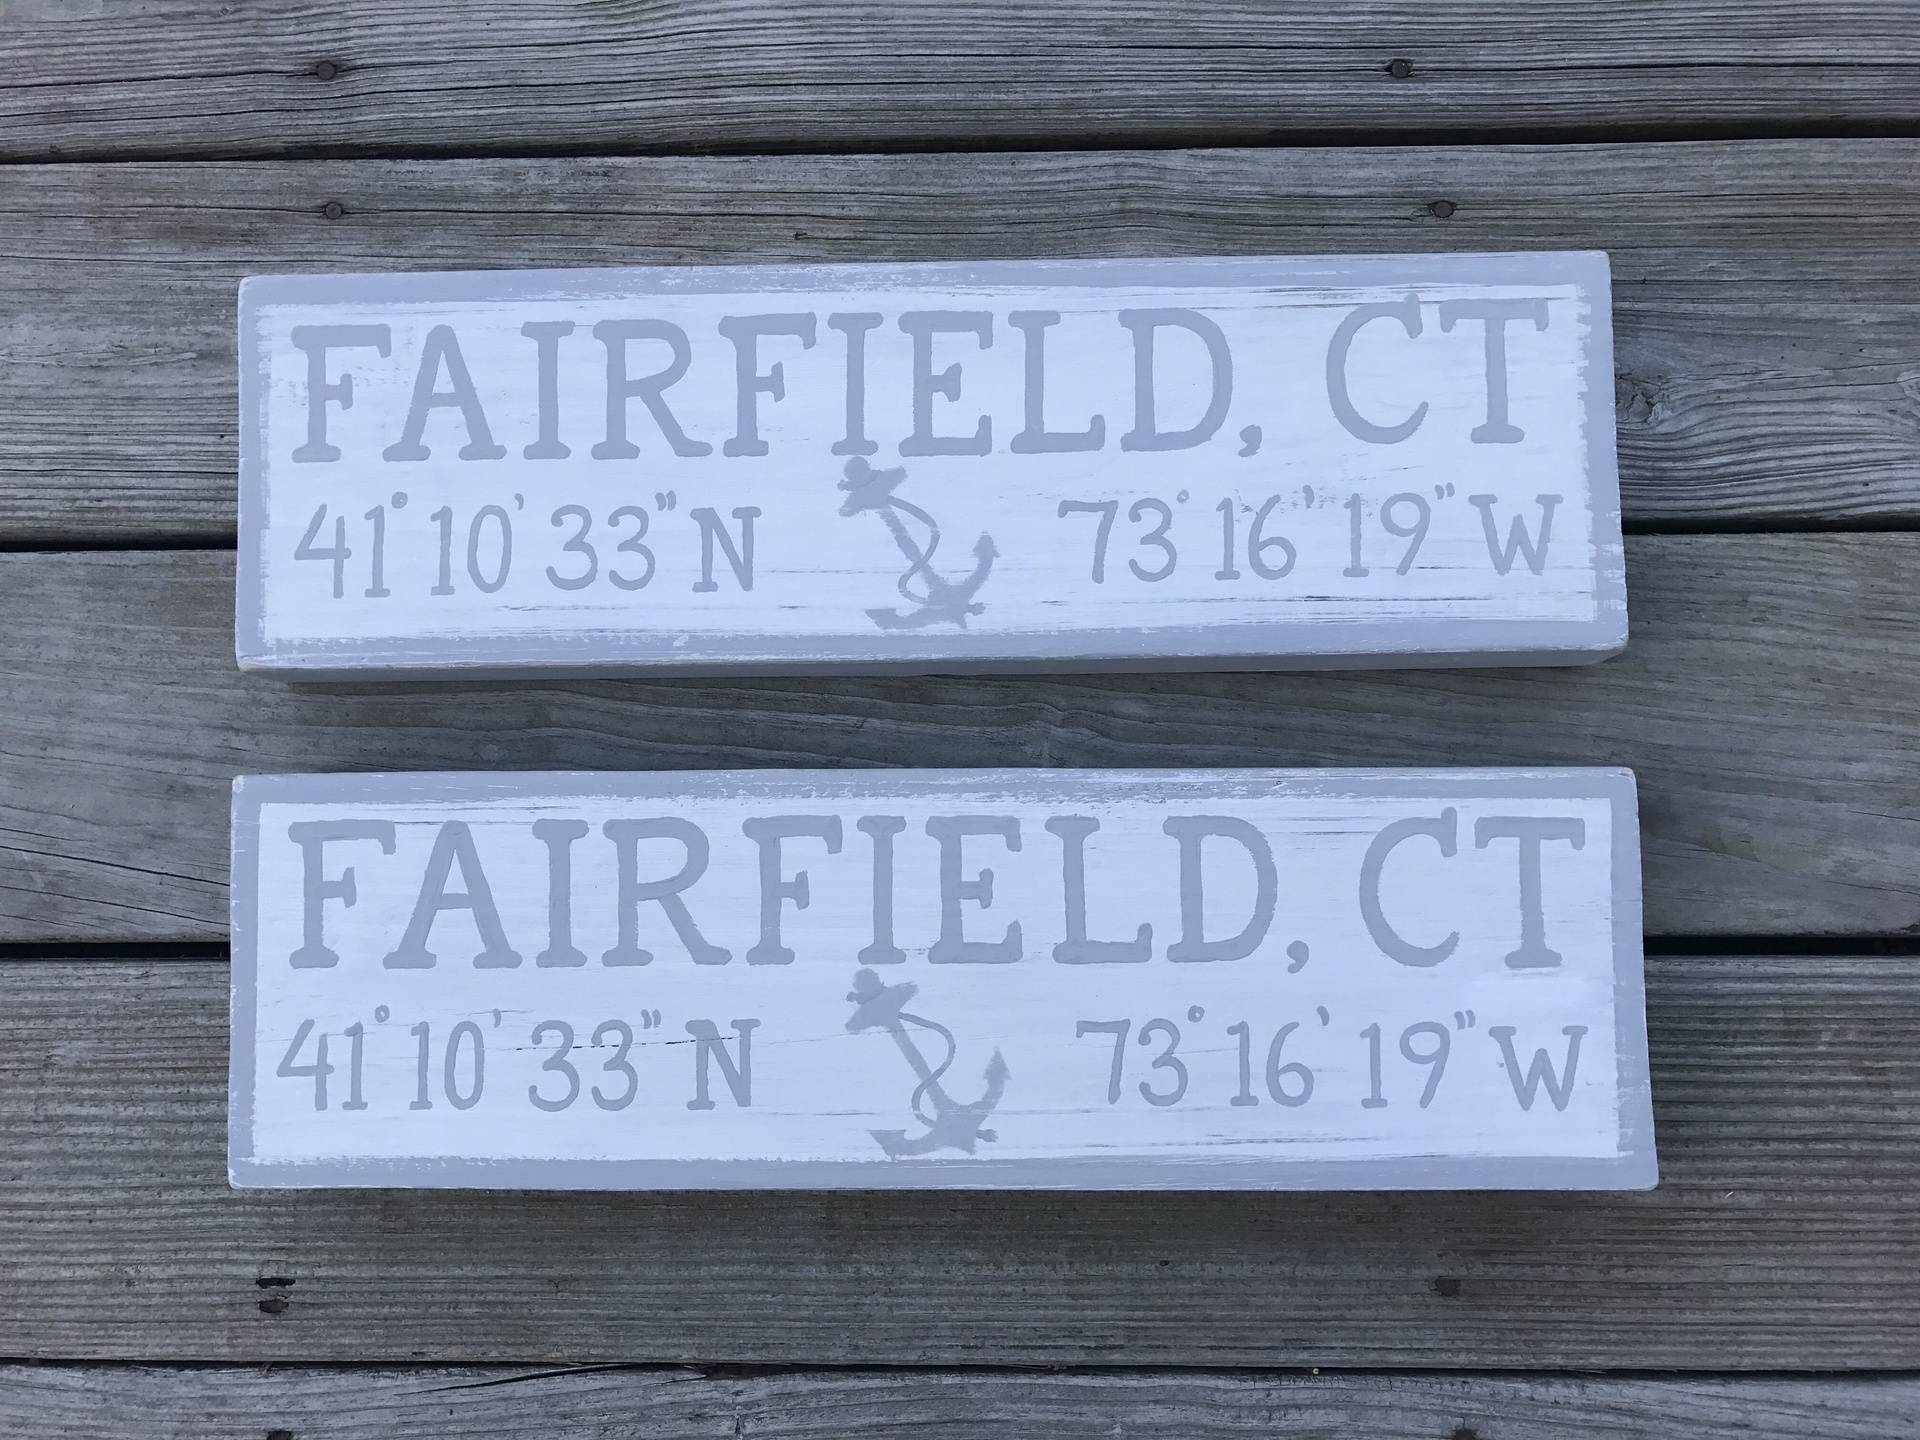 Fairfield, CT sign